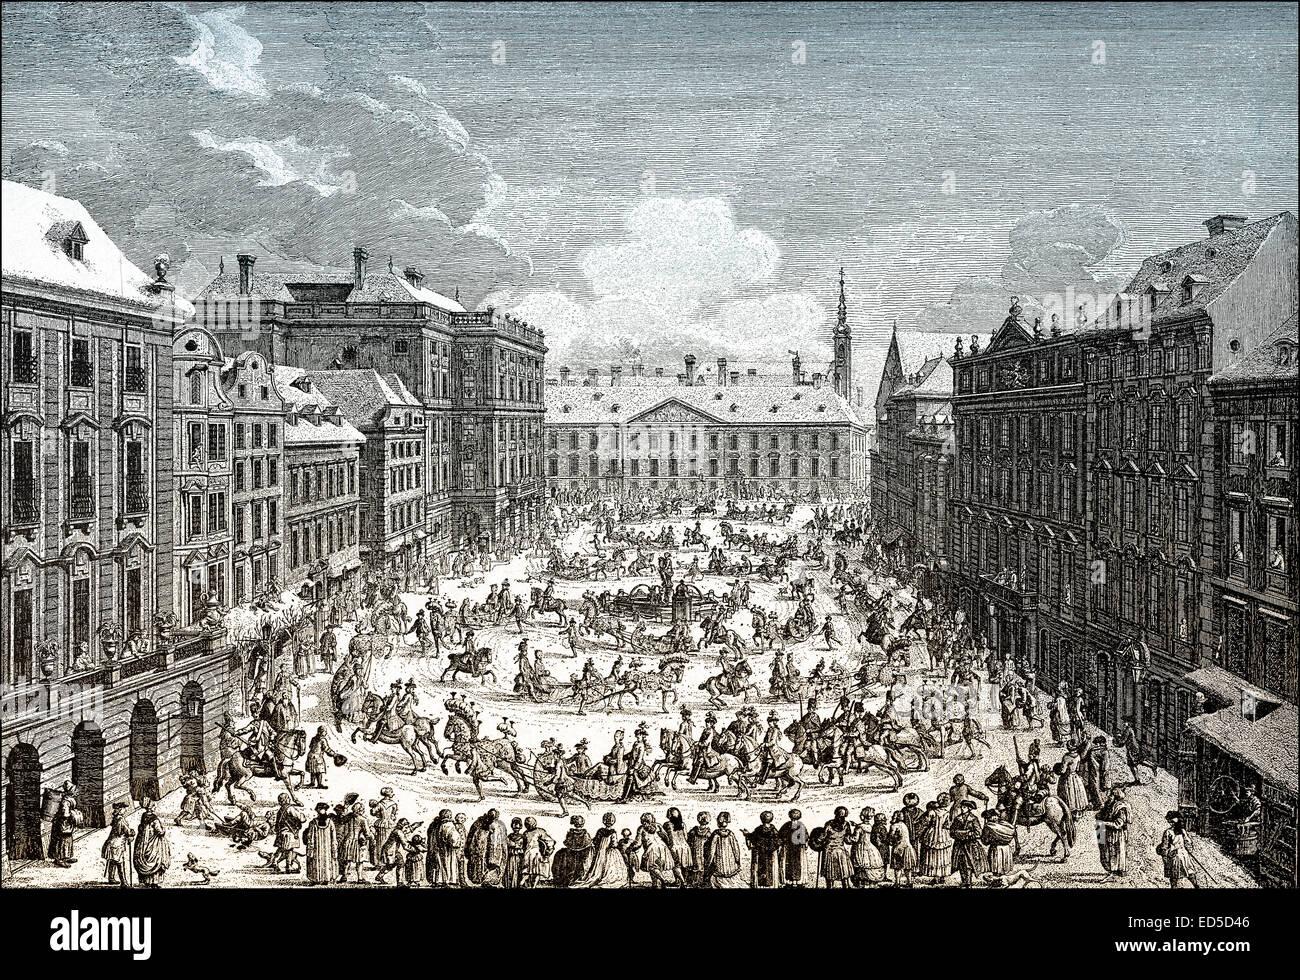 Historical cityscape of Vienna, Imperial sleigh ride, The Neue Markt or Mehlmarkt, market place, 18th century, Austria, - Stock Image